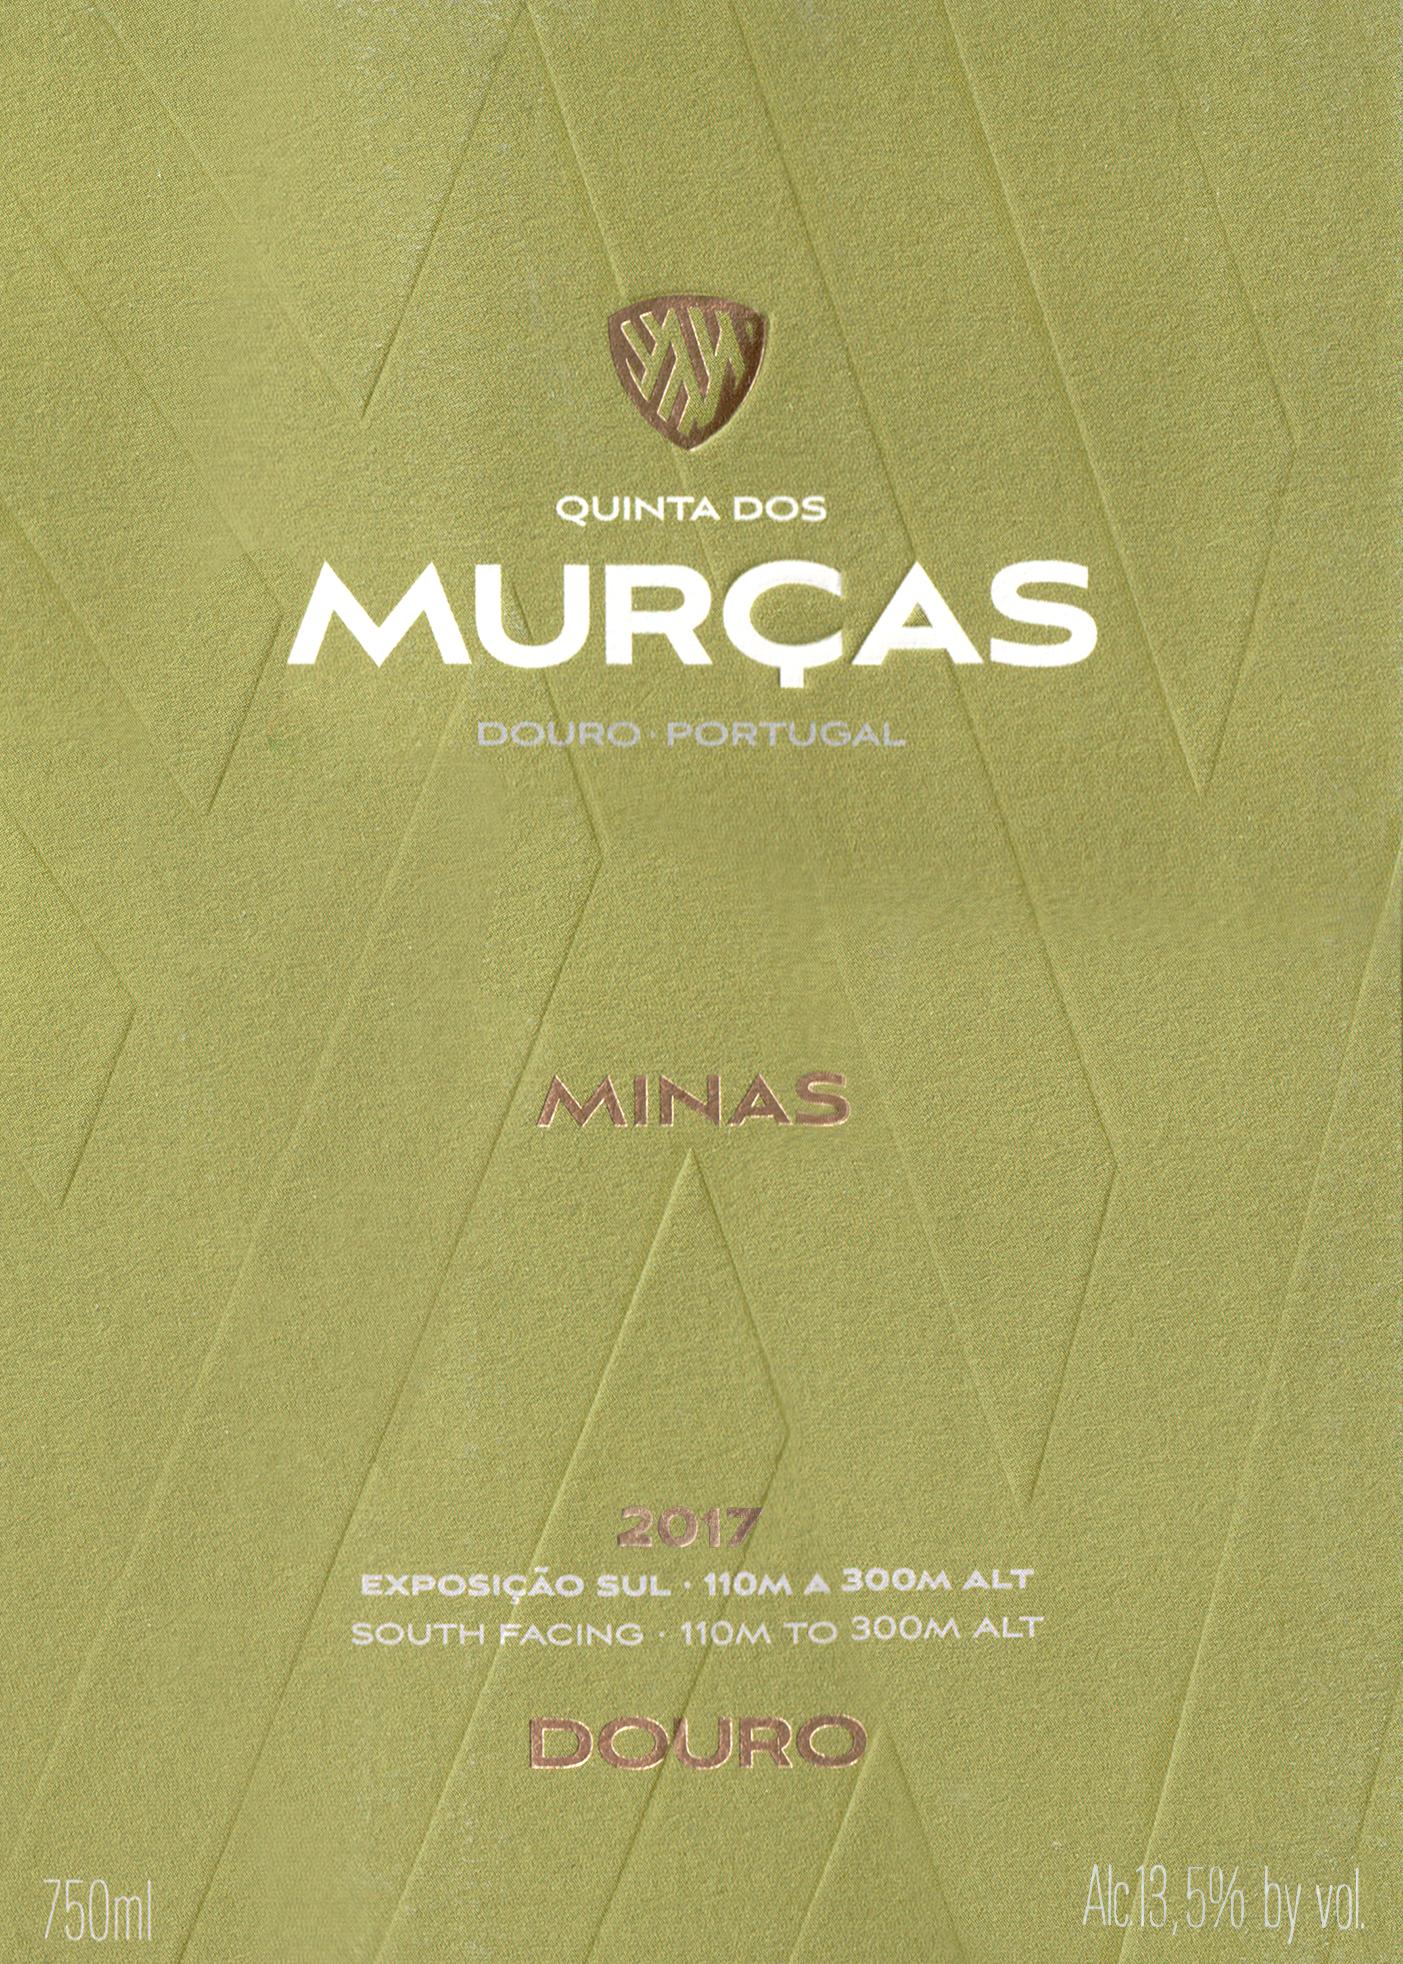 Esporao Quinta Dos Murcas Minas 2017